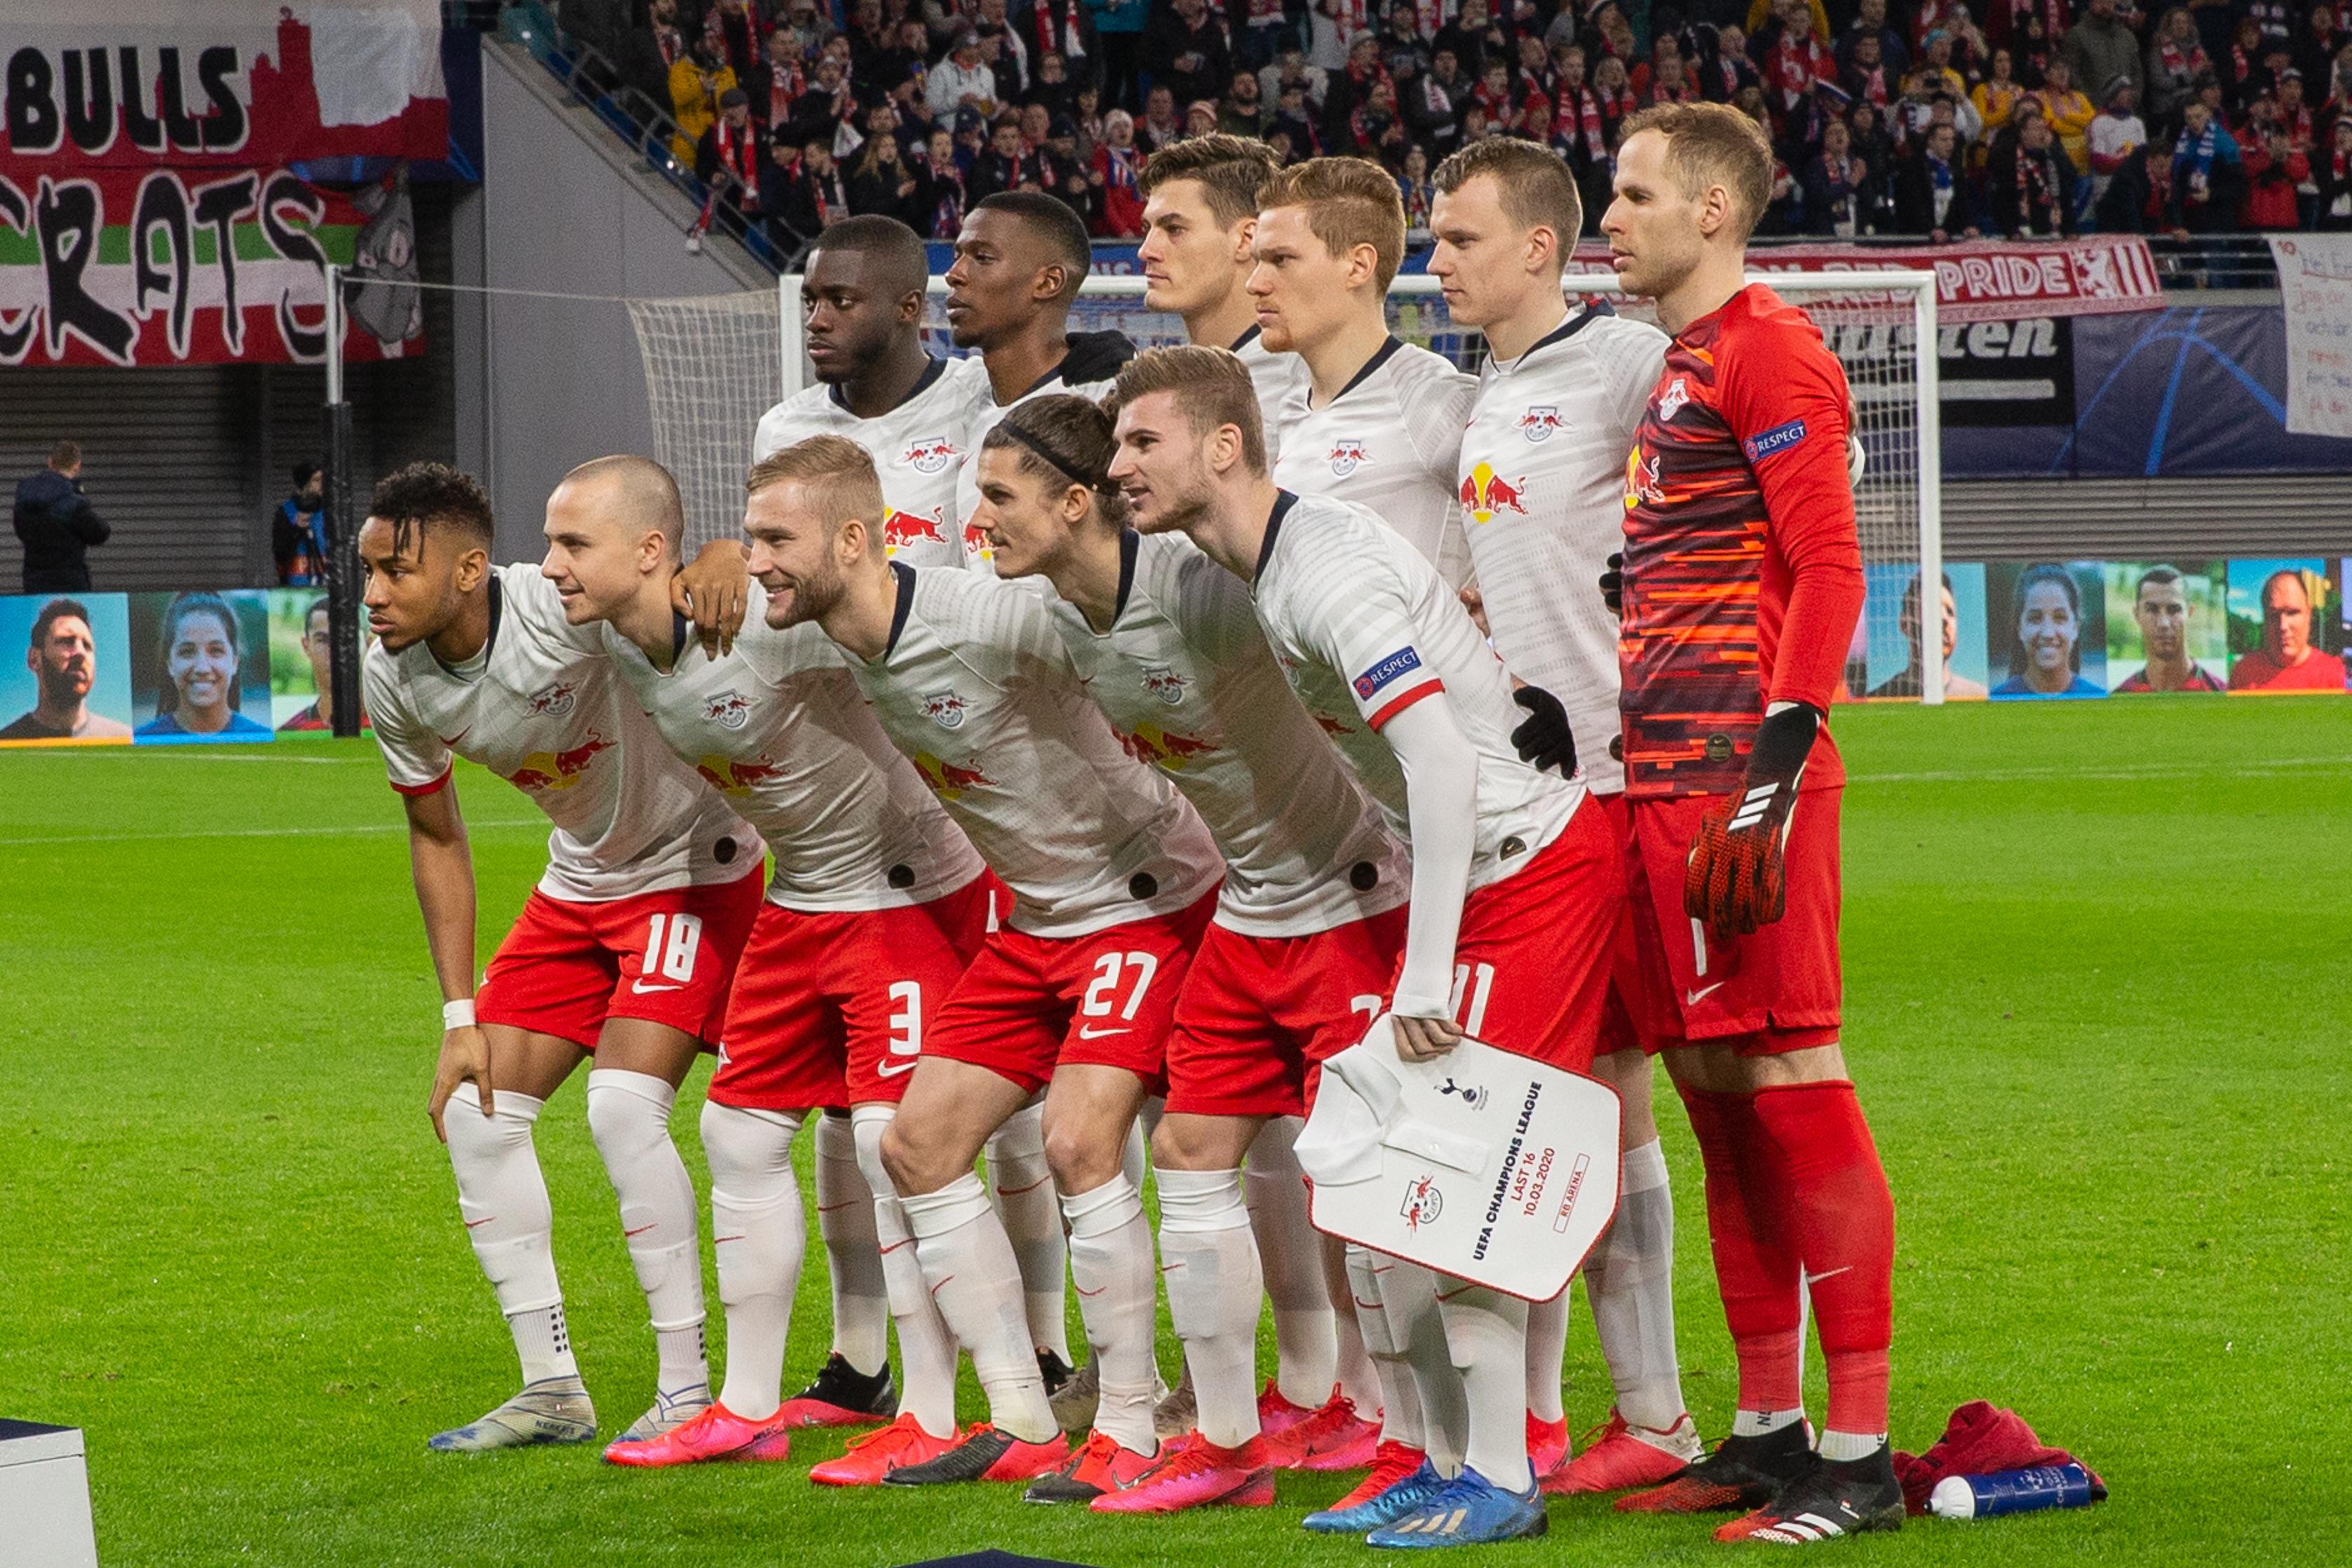 RasenBallsport Leipzig 2019-2020 - Wikipedia